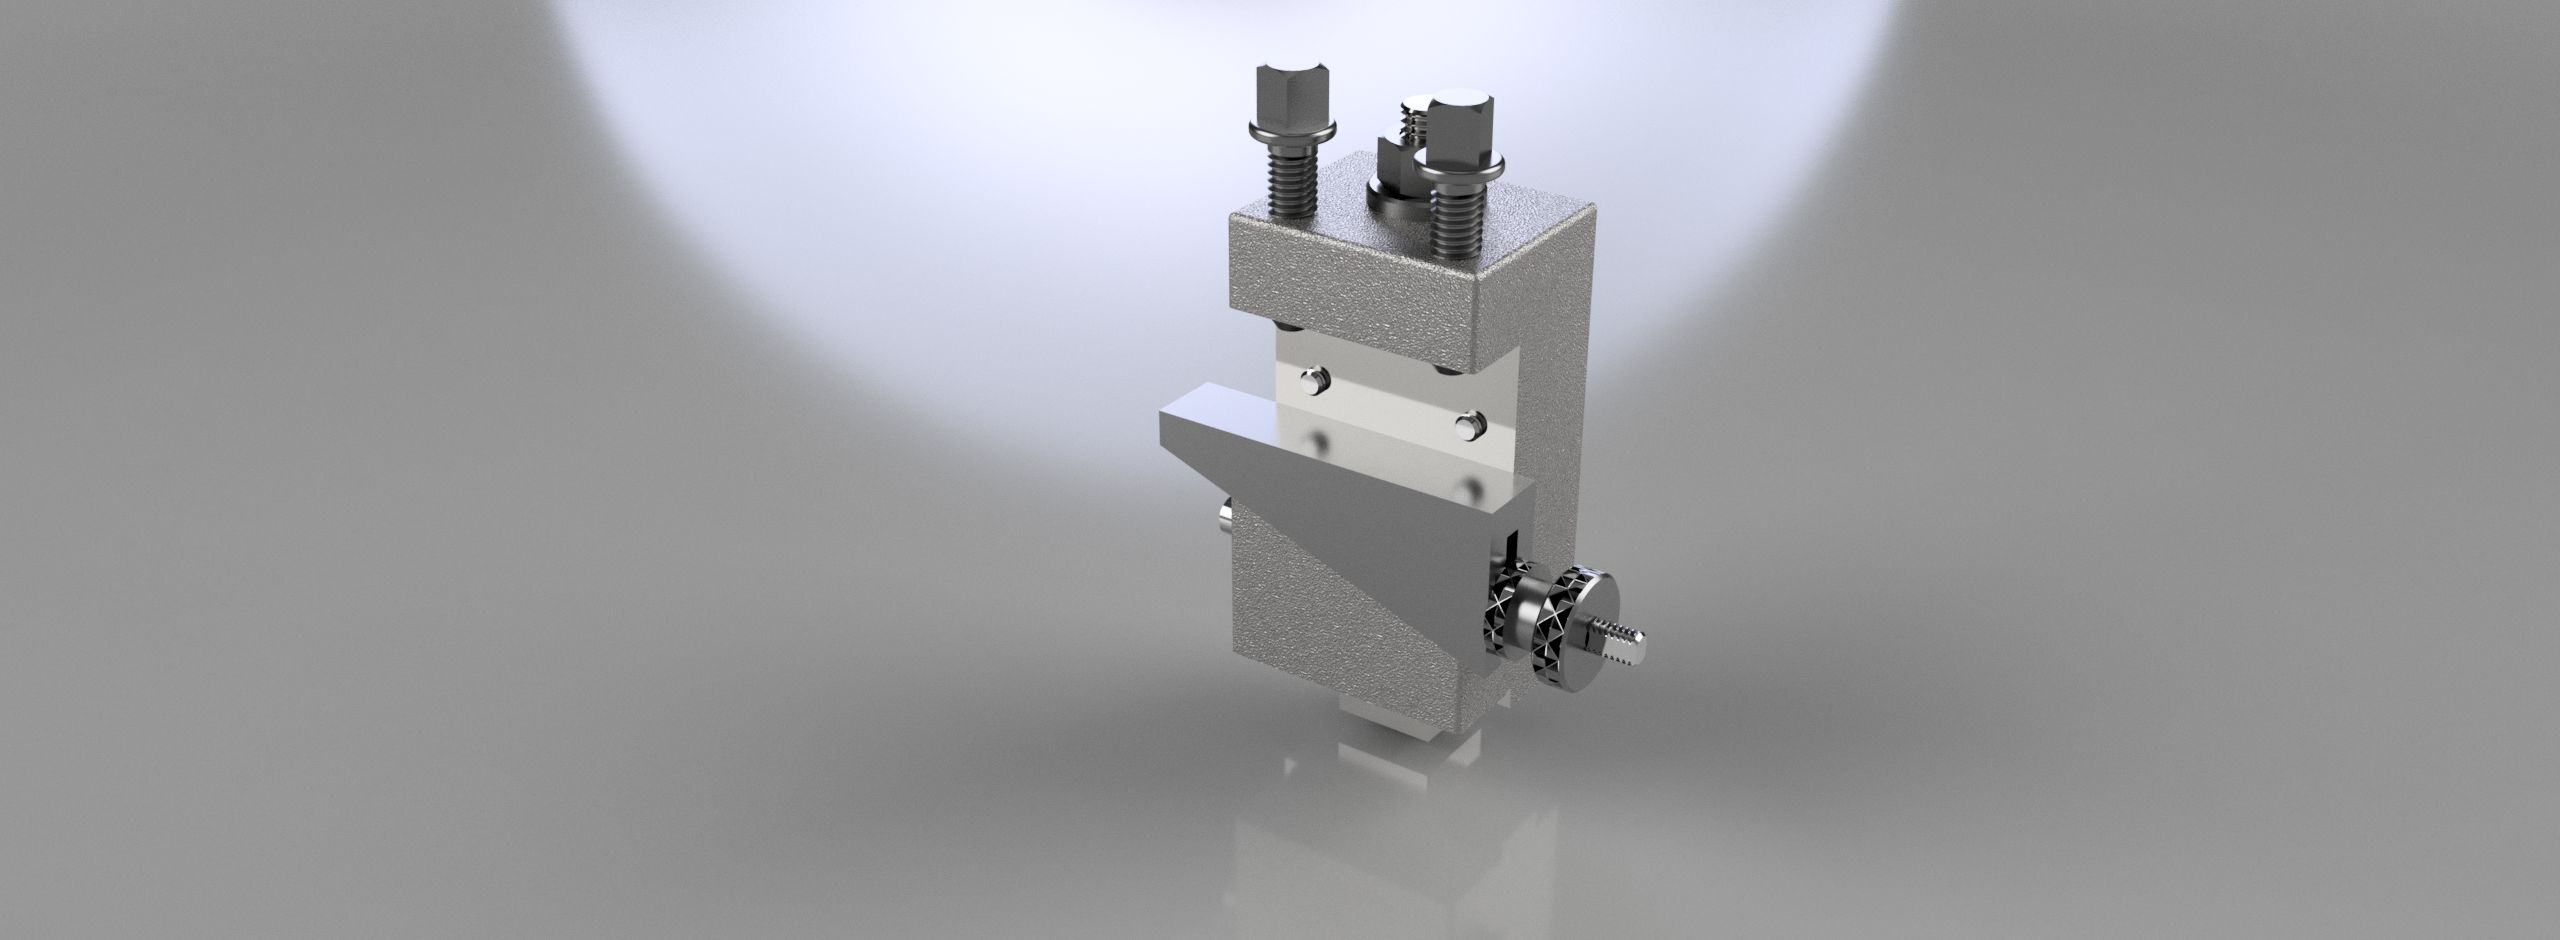 Tool-post-v12-3500-3500